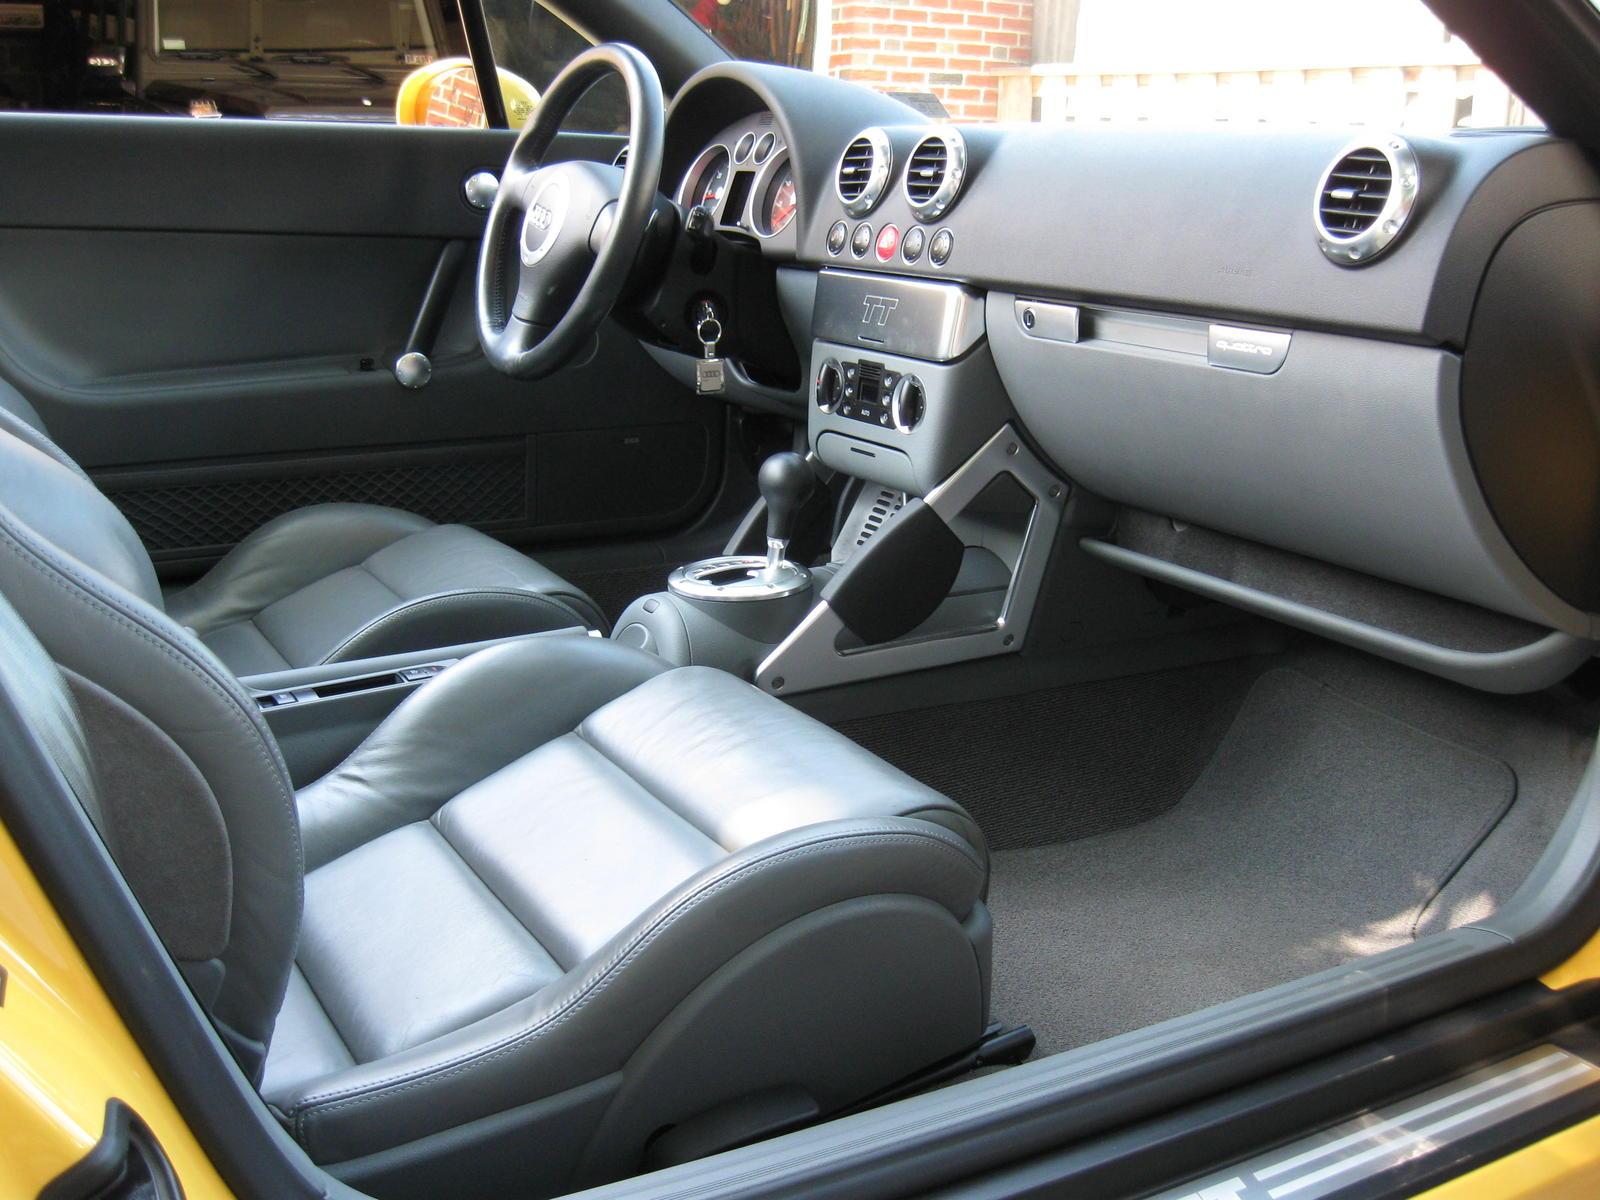 2004 Audi Tt Image 8